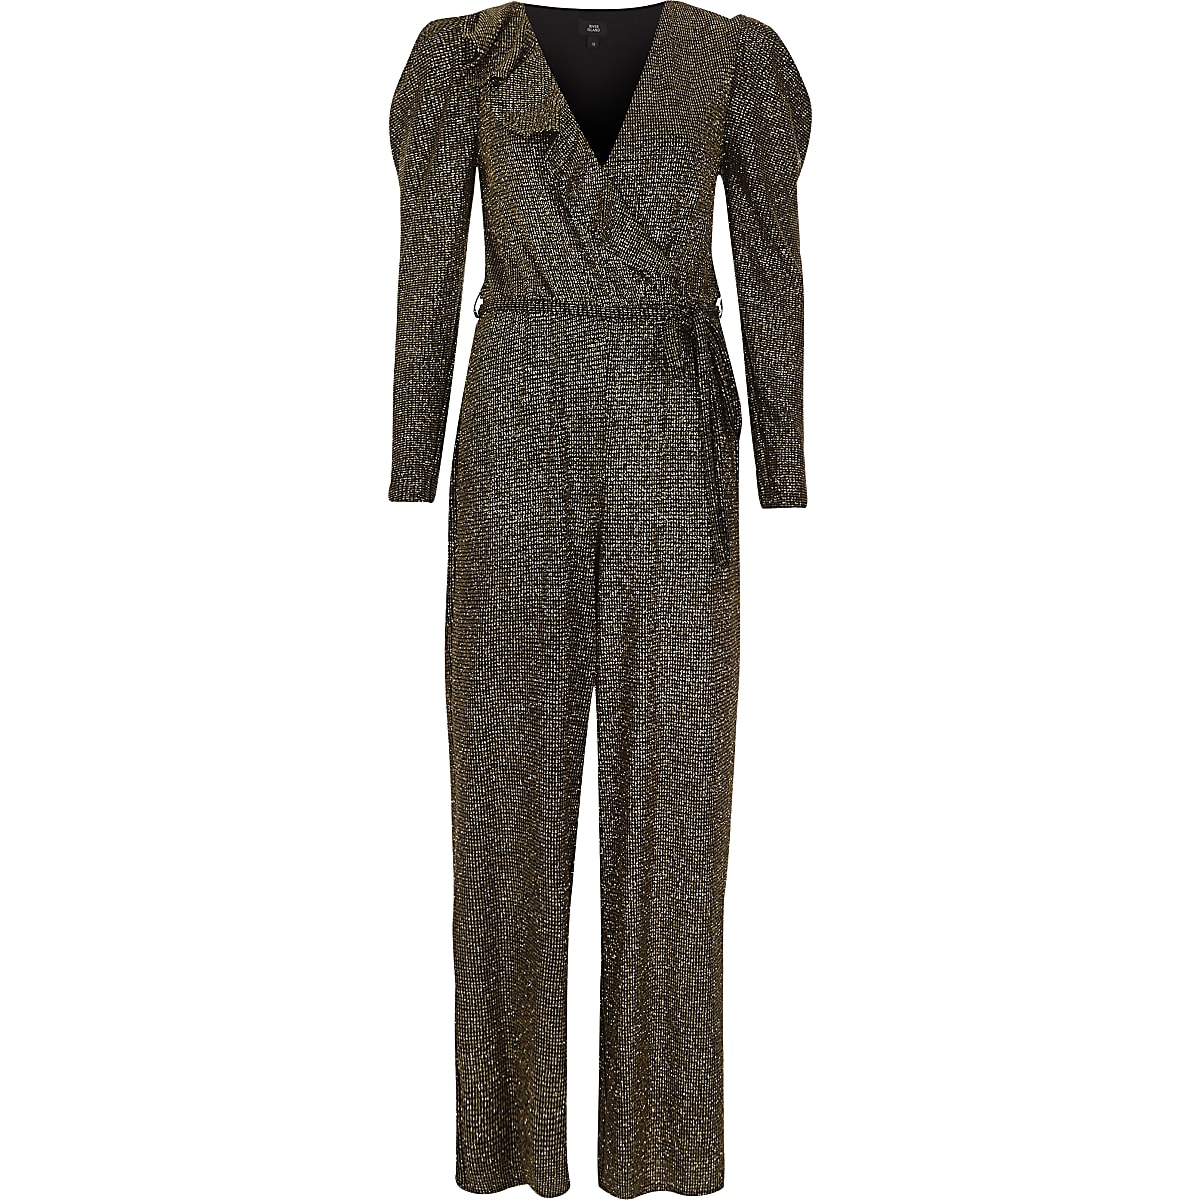 94e13fe15d79f Gold metallic glitter frill wrap jumpsuit - Jumpsuits - Playsuits &  Jumpsuits - women